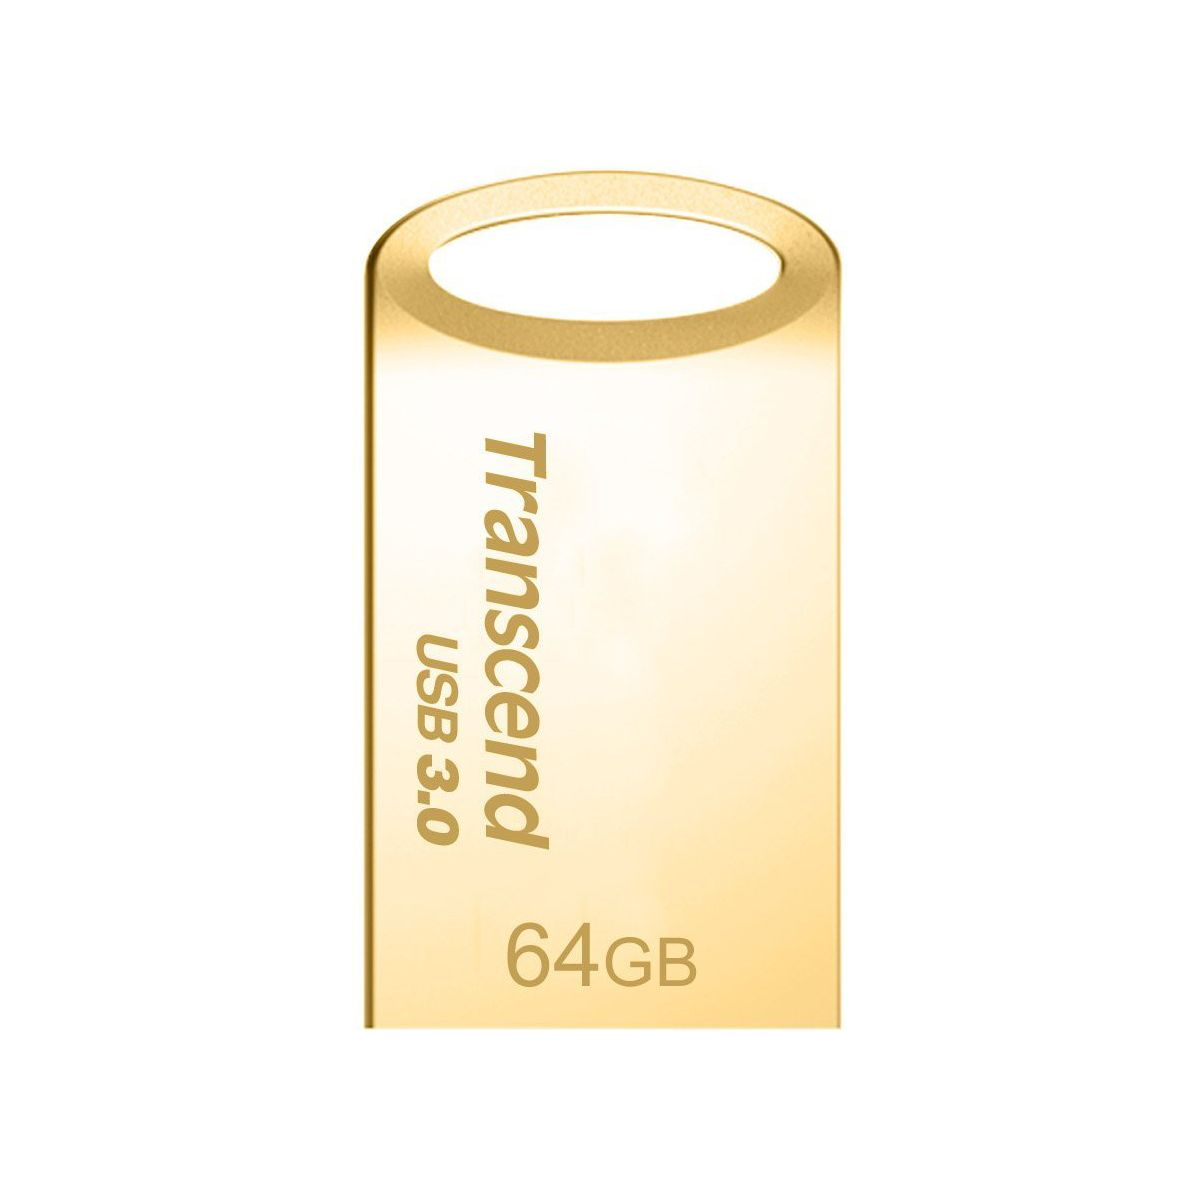 Clé USB TRANSCEND 64Go JetFlash 710, Gold Plating USB 3.0